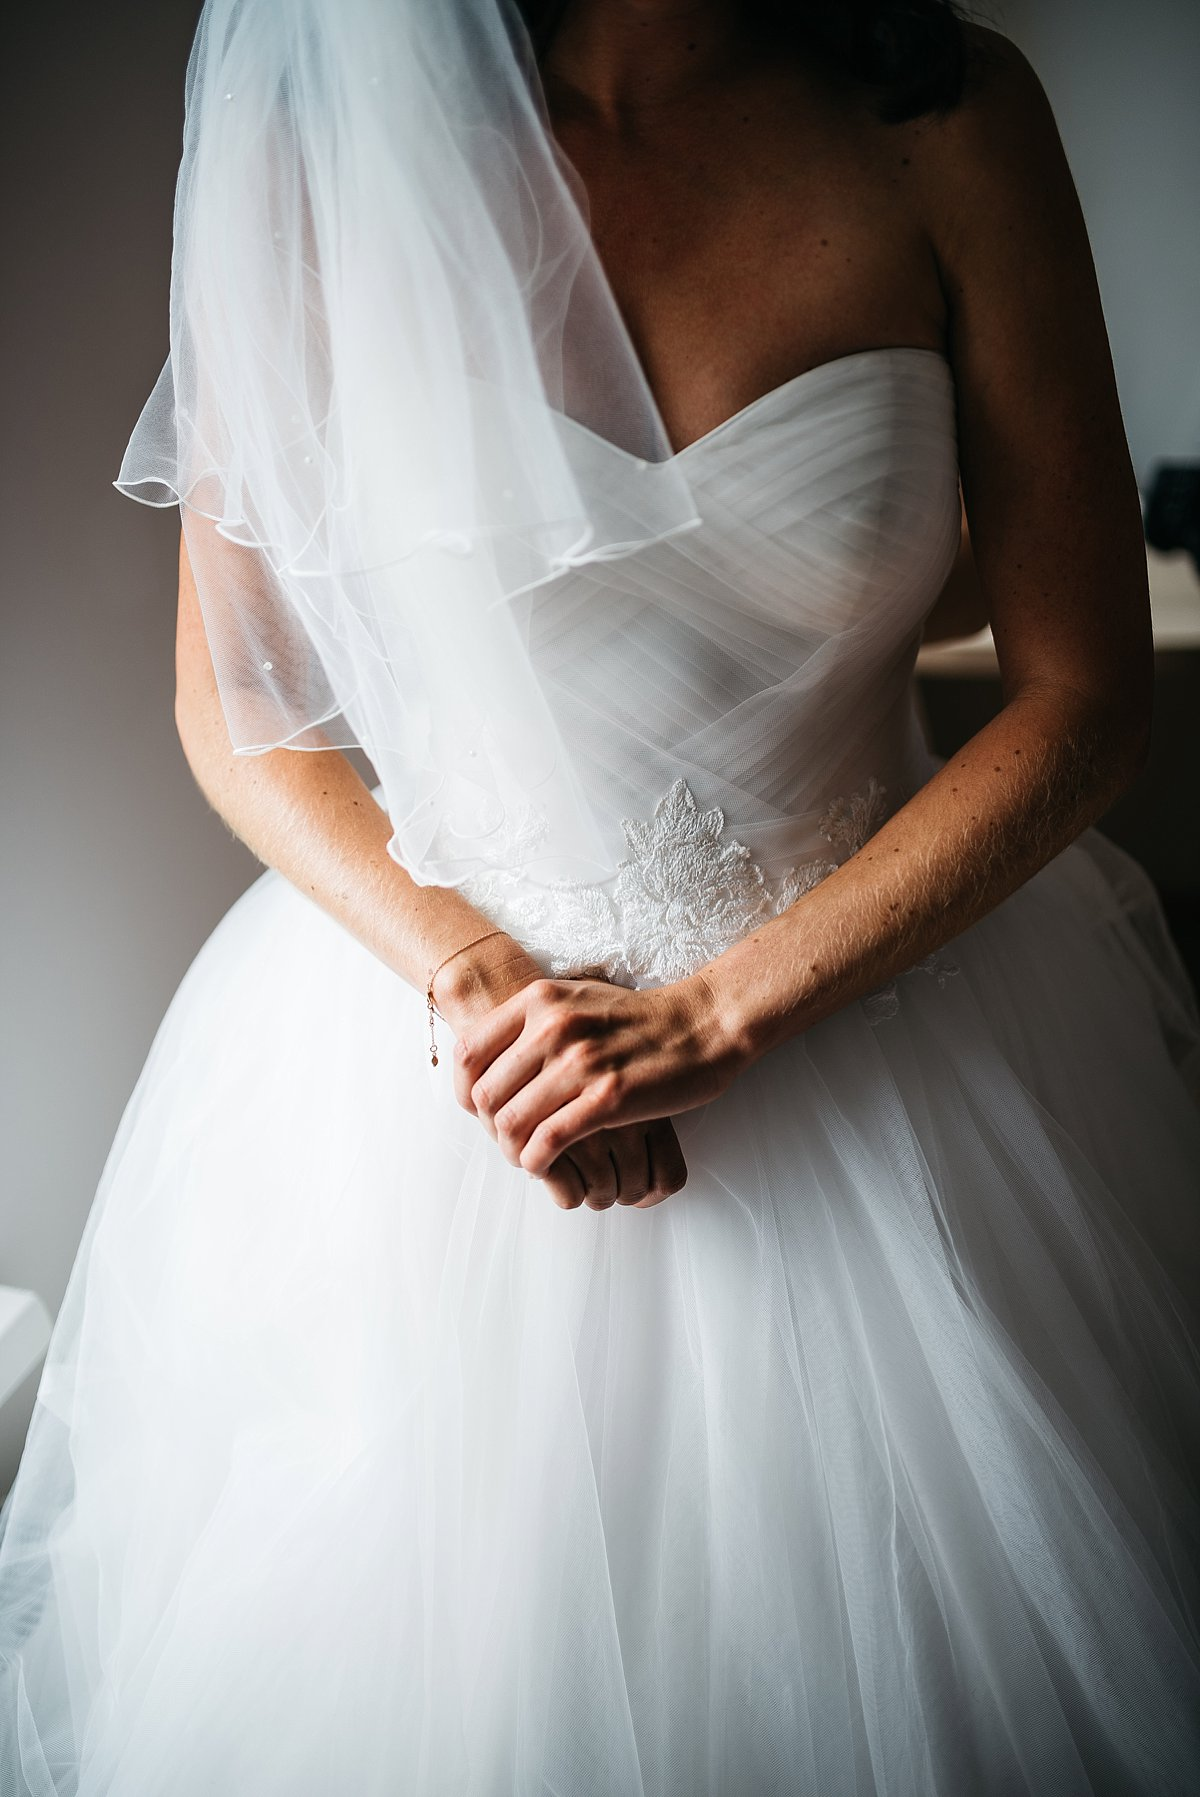 daniel-lopez-perez-wedding-photographer-austria-030